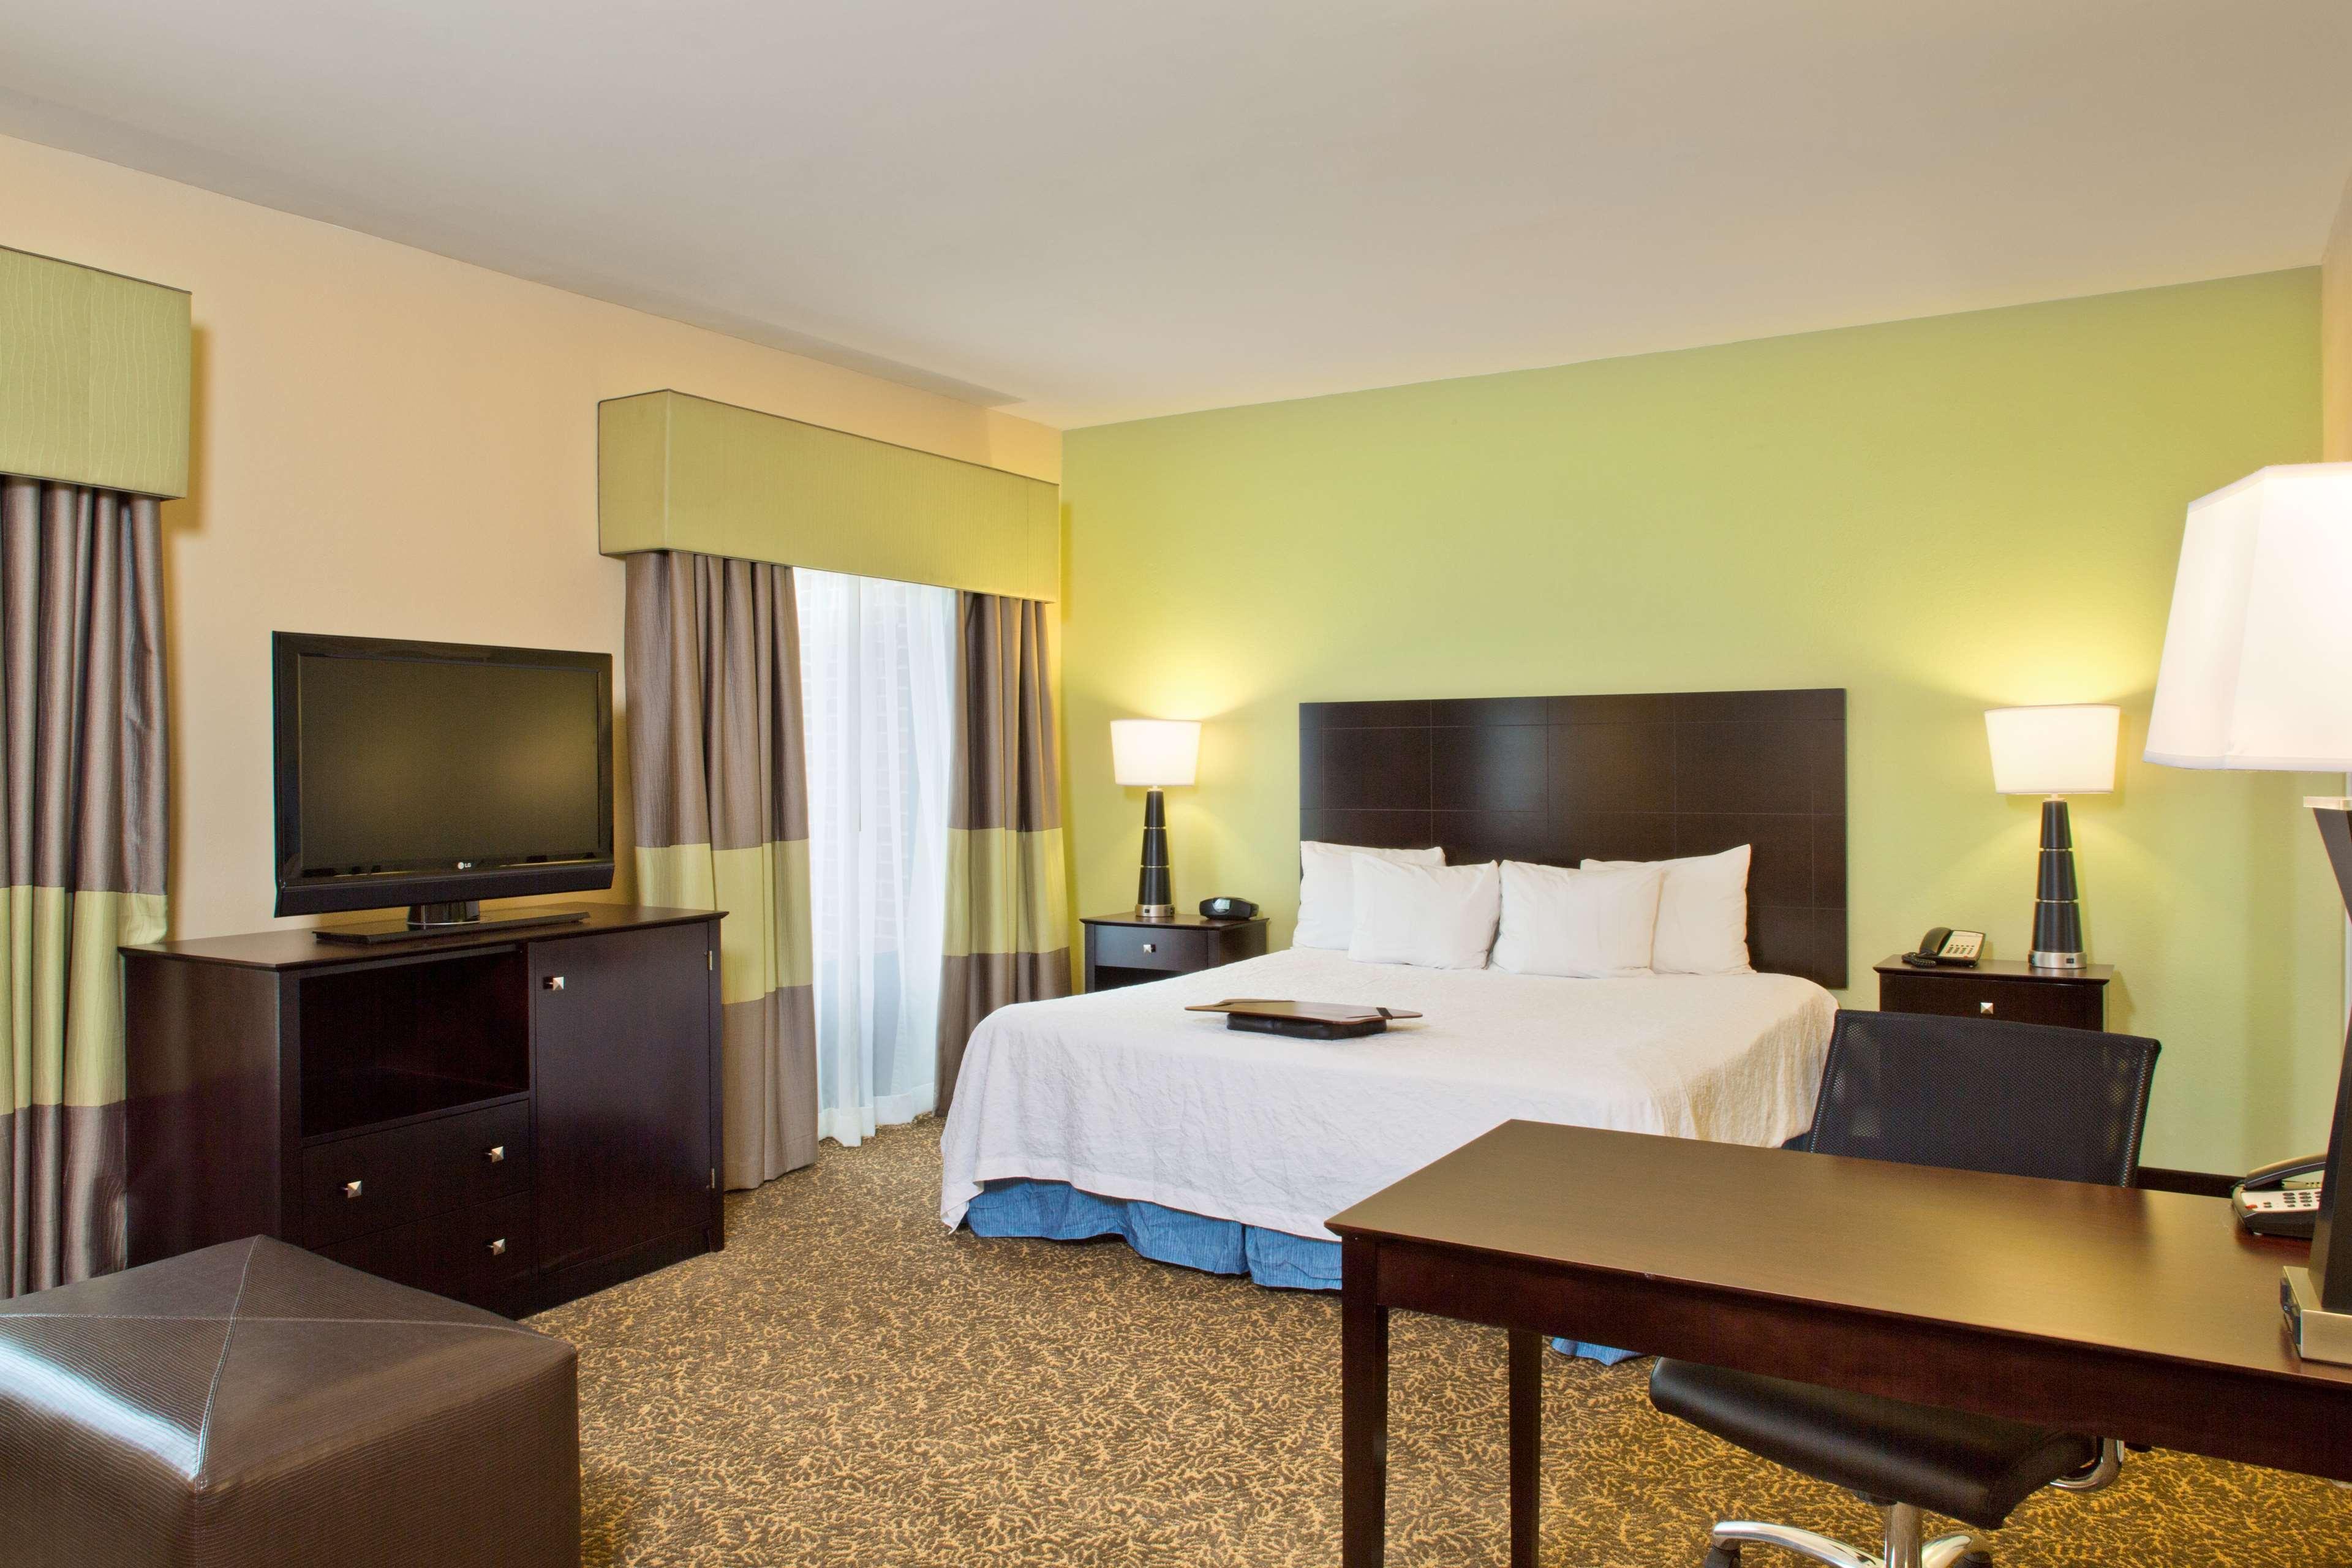 Hampton Inn & Suites Arundel Mills/Baltimore image 11